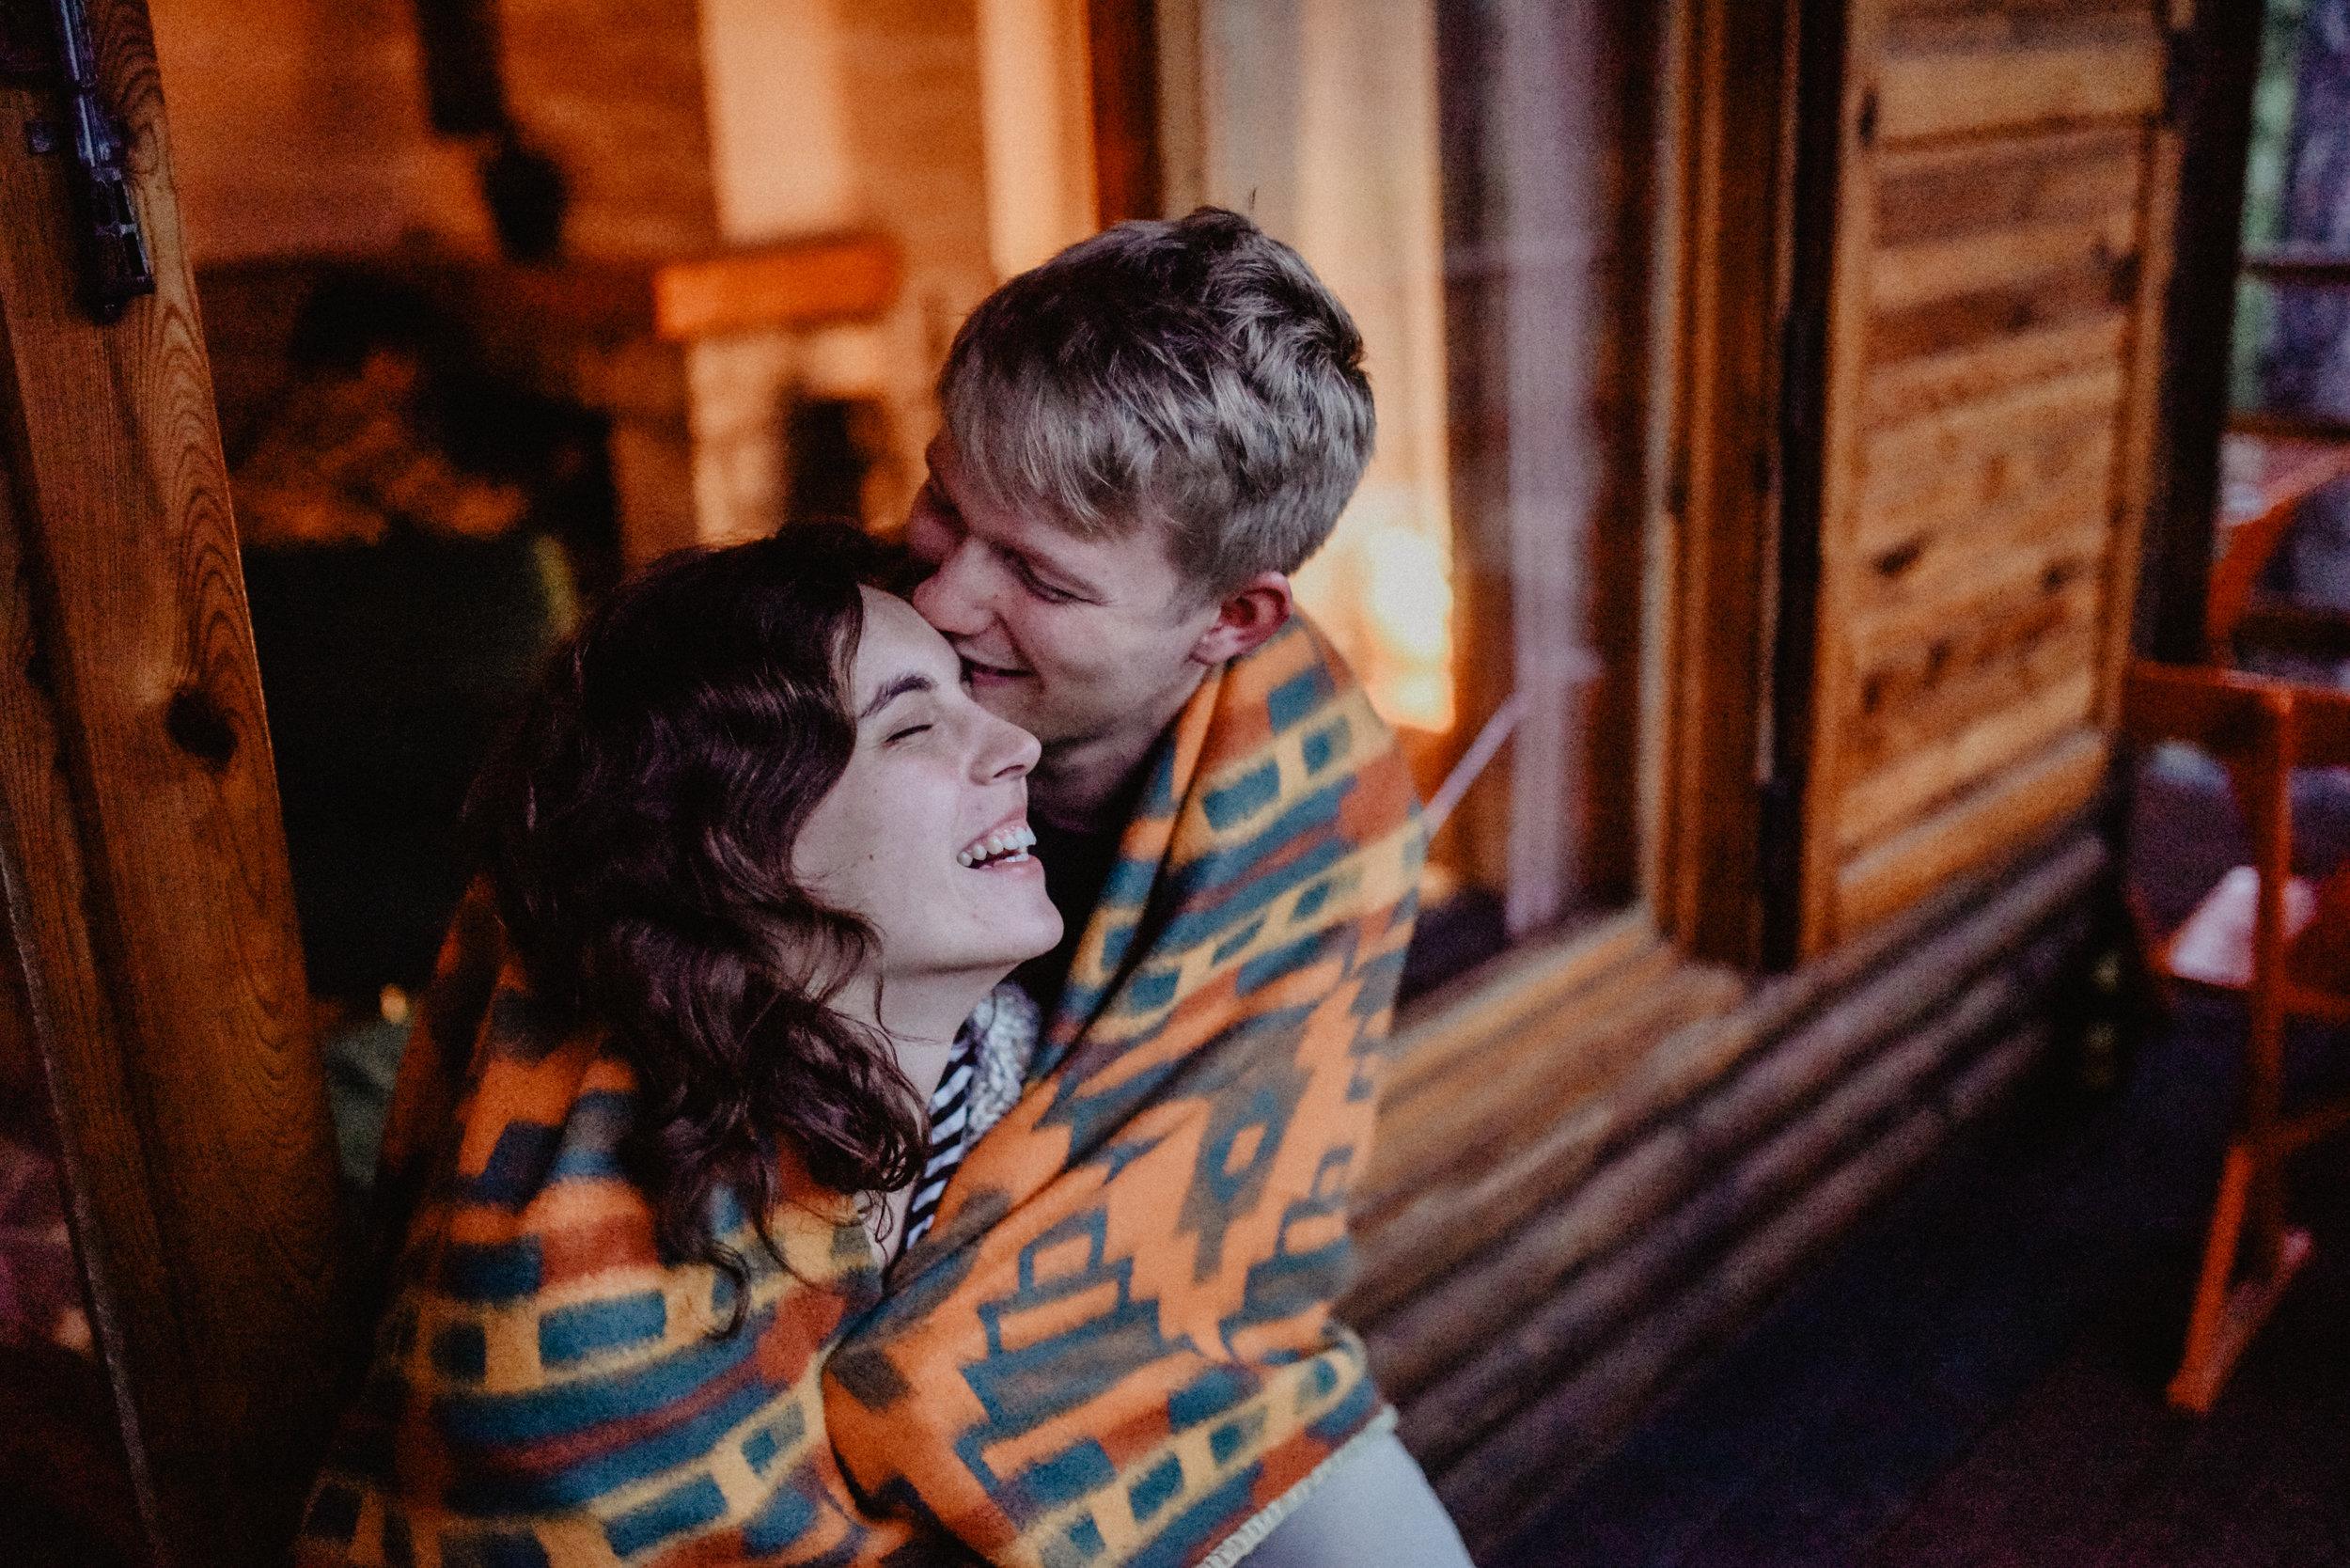 findan & dora - czech republic /may 2019 / couples